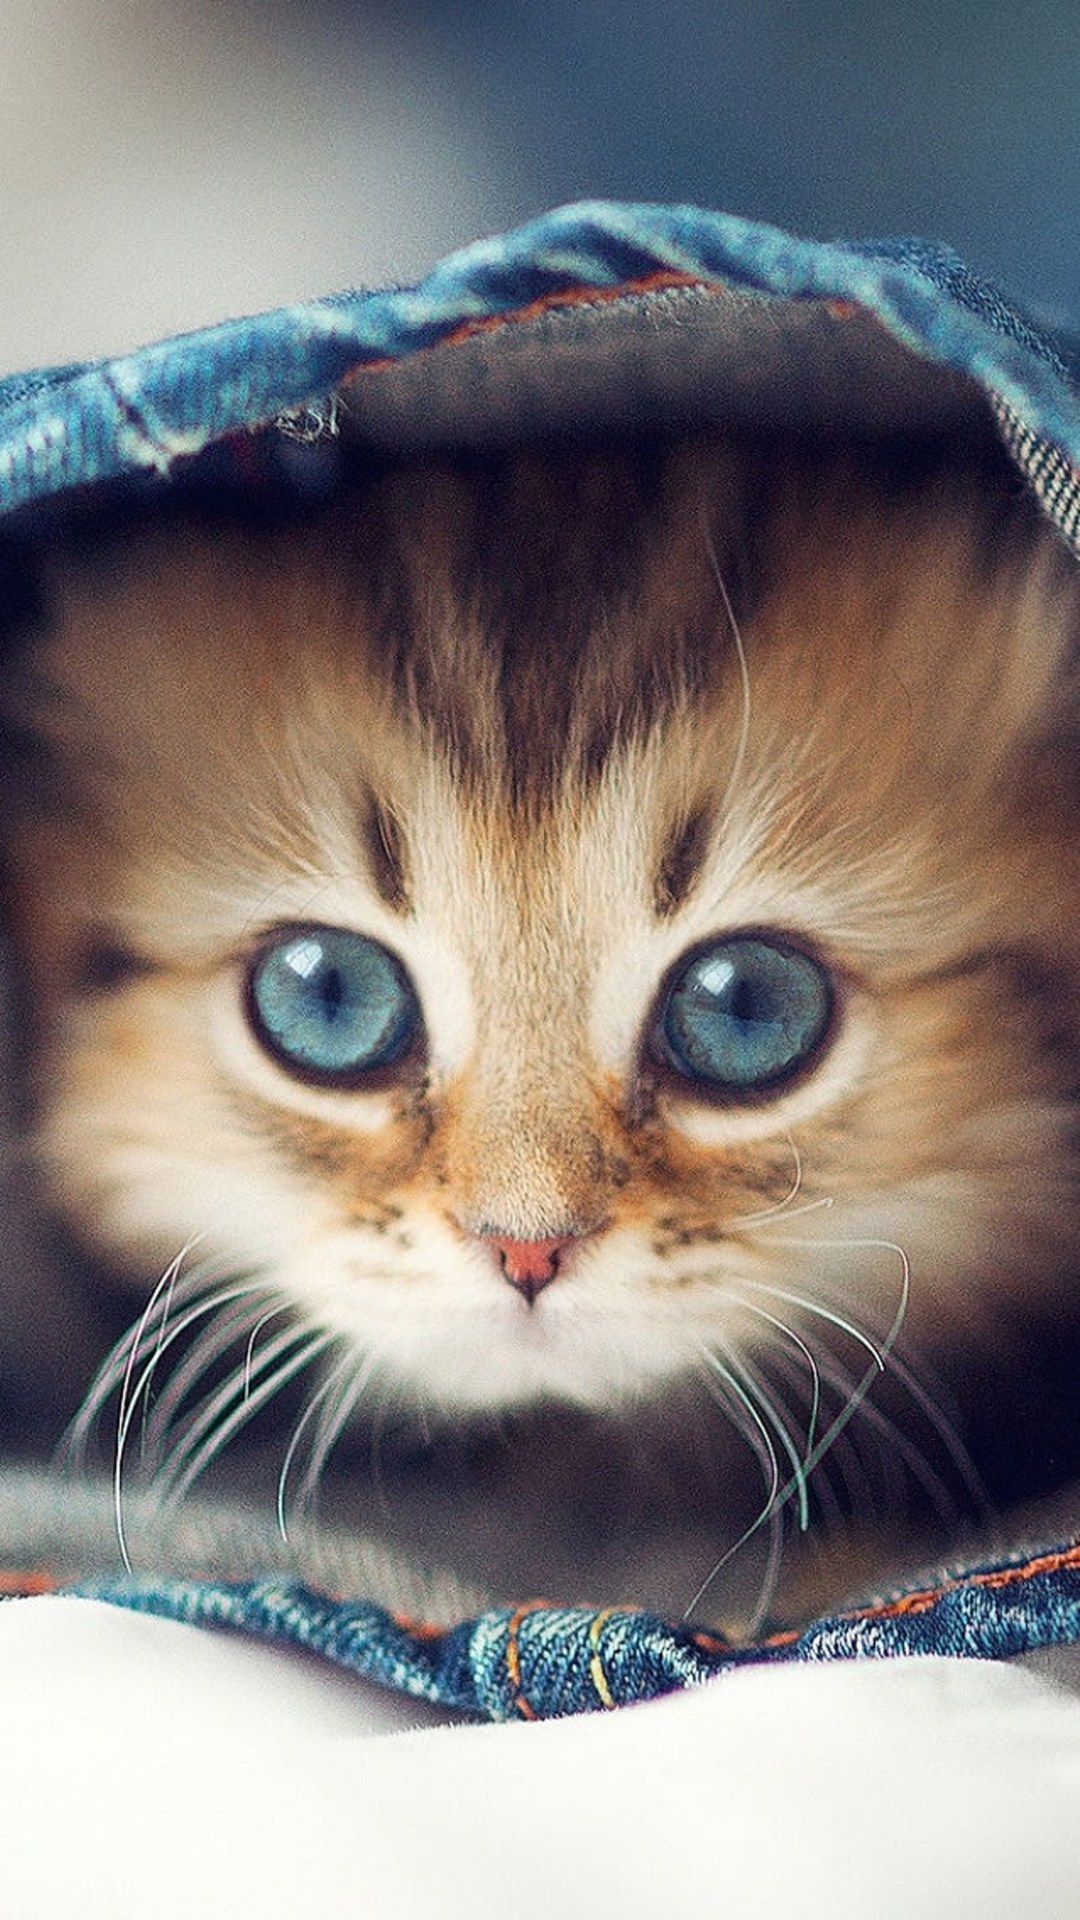 خلفيات قطط كيوت جدا 18